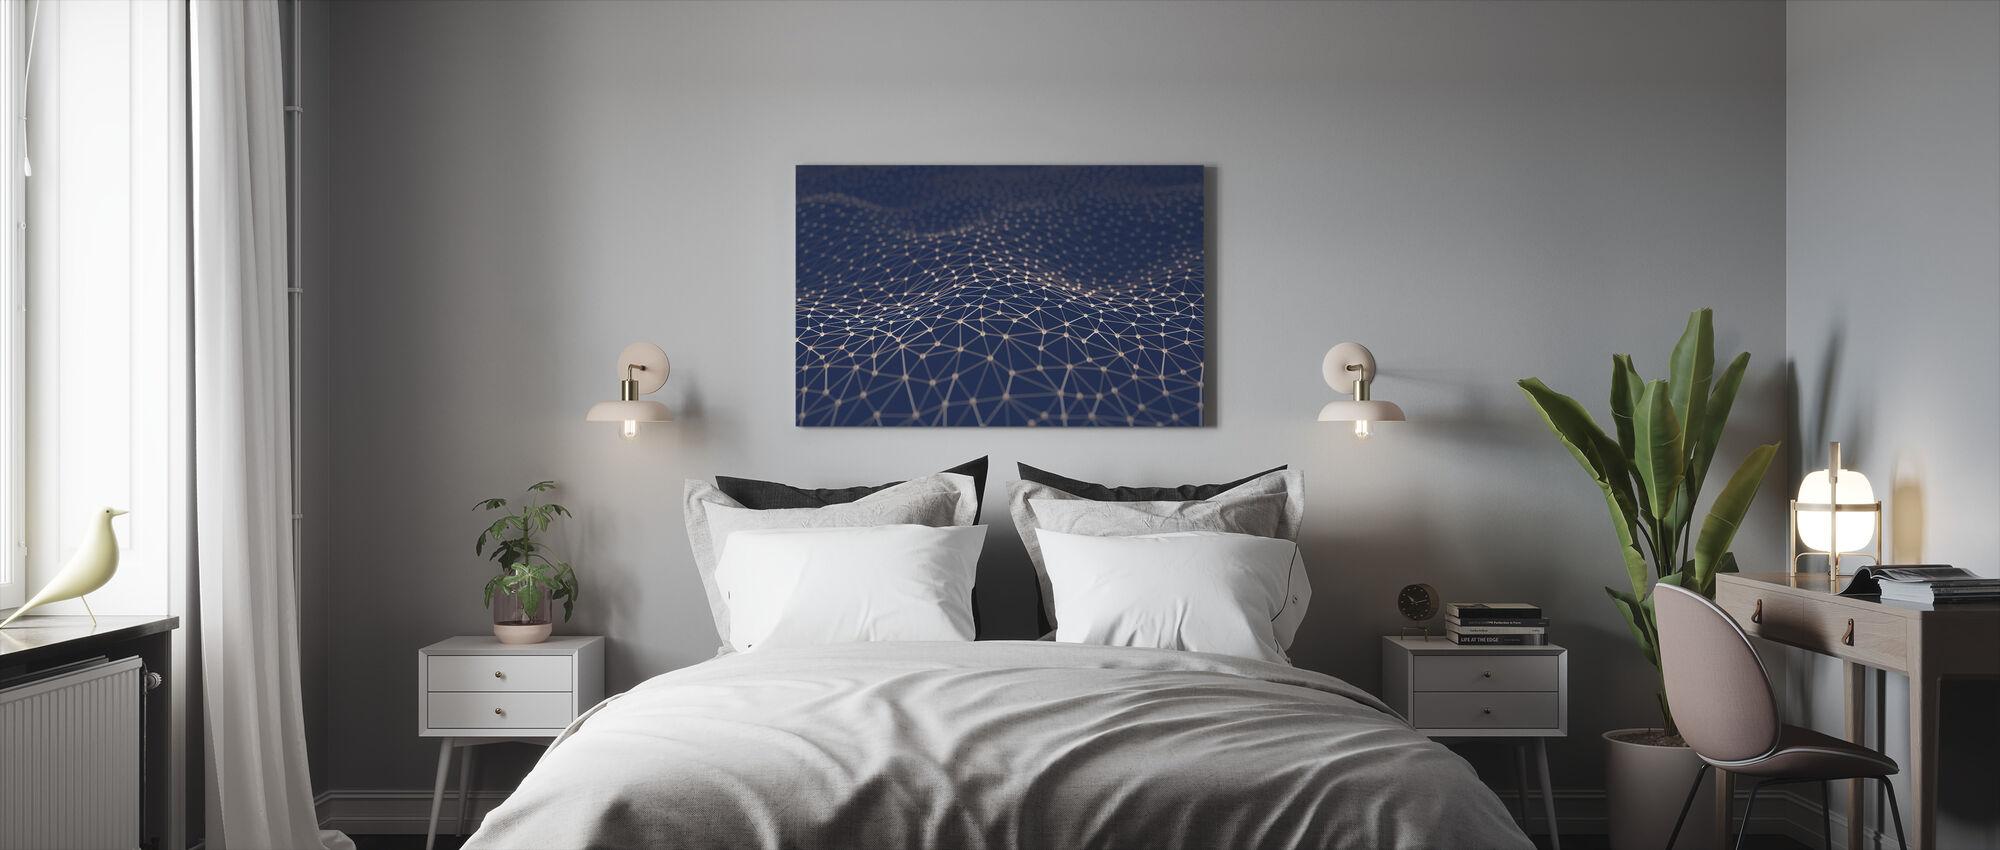 Interconnecting - Canvas print - Bedroom